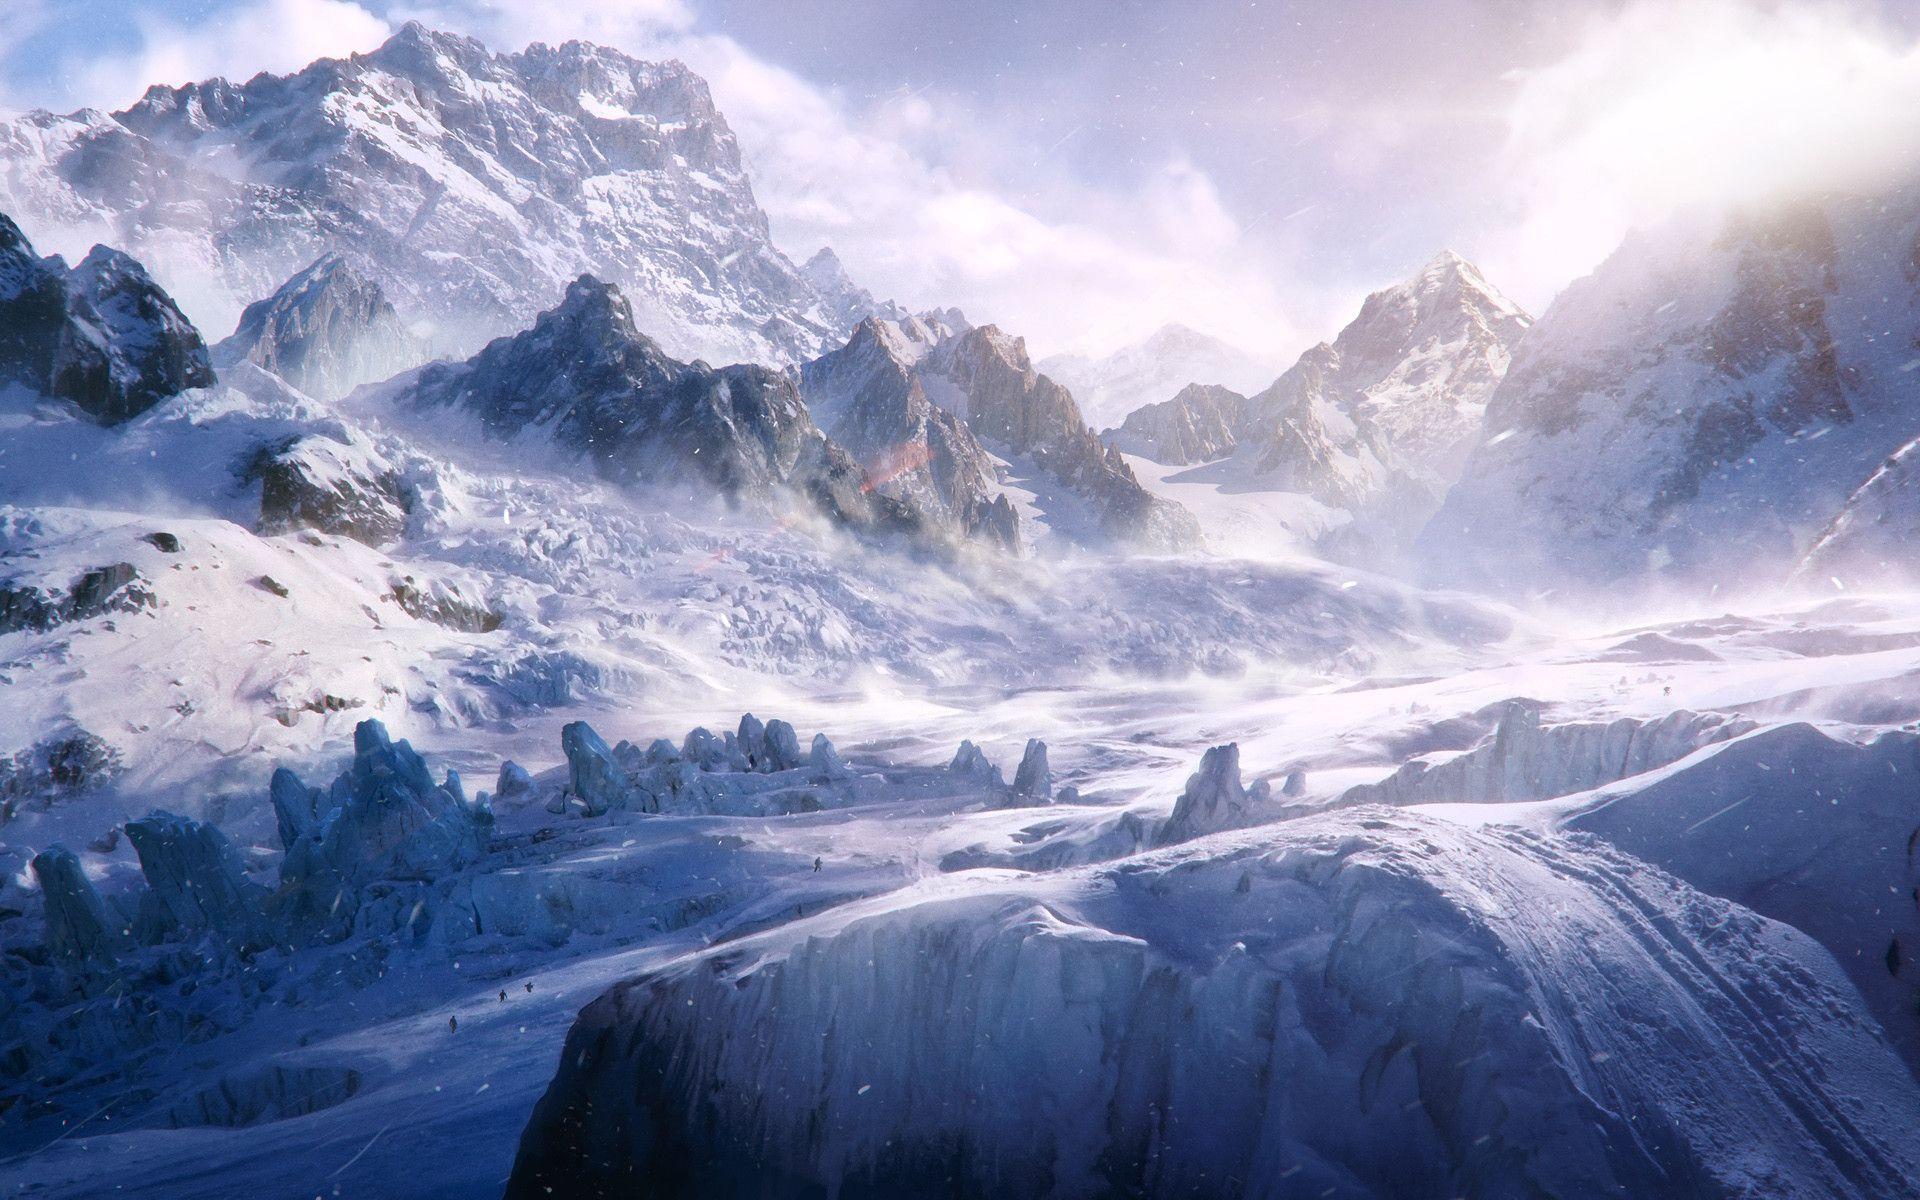 Frozen Tundra 1920 X 1200 Beautiful Landscape Wallpaper Hd Landscape Landscape Wallpaper